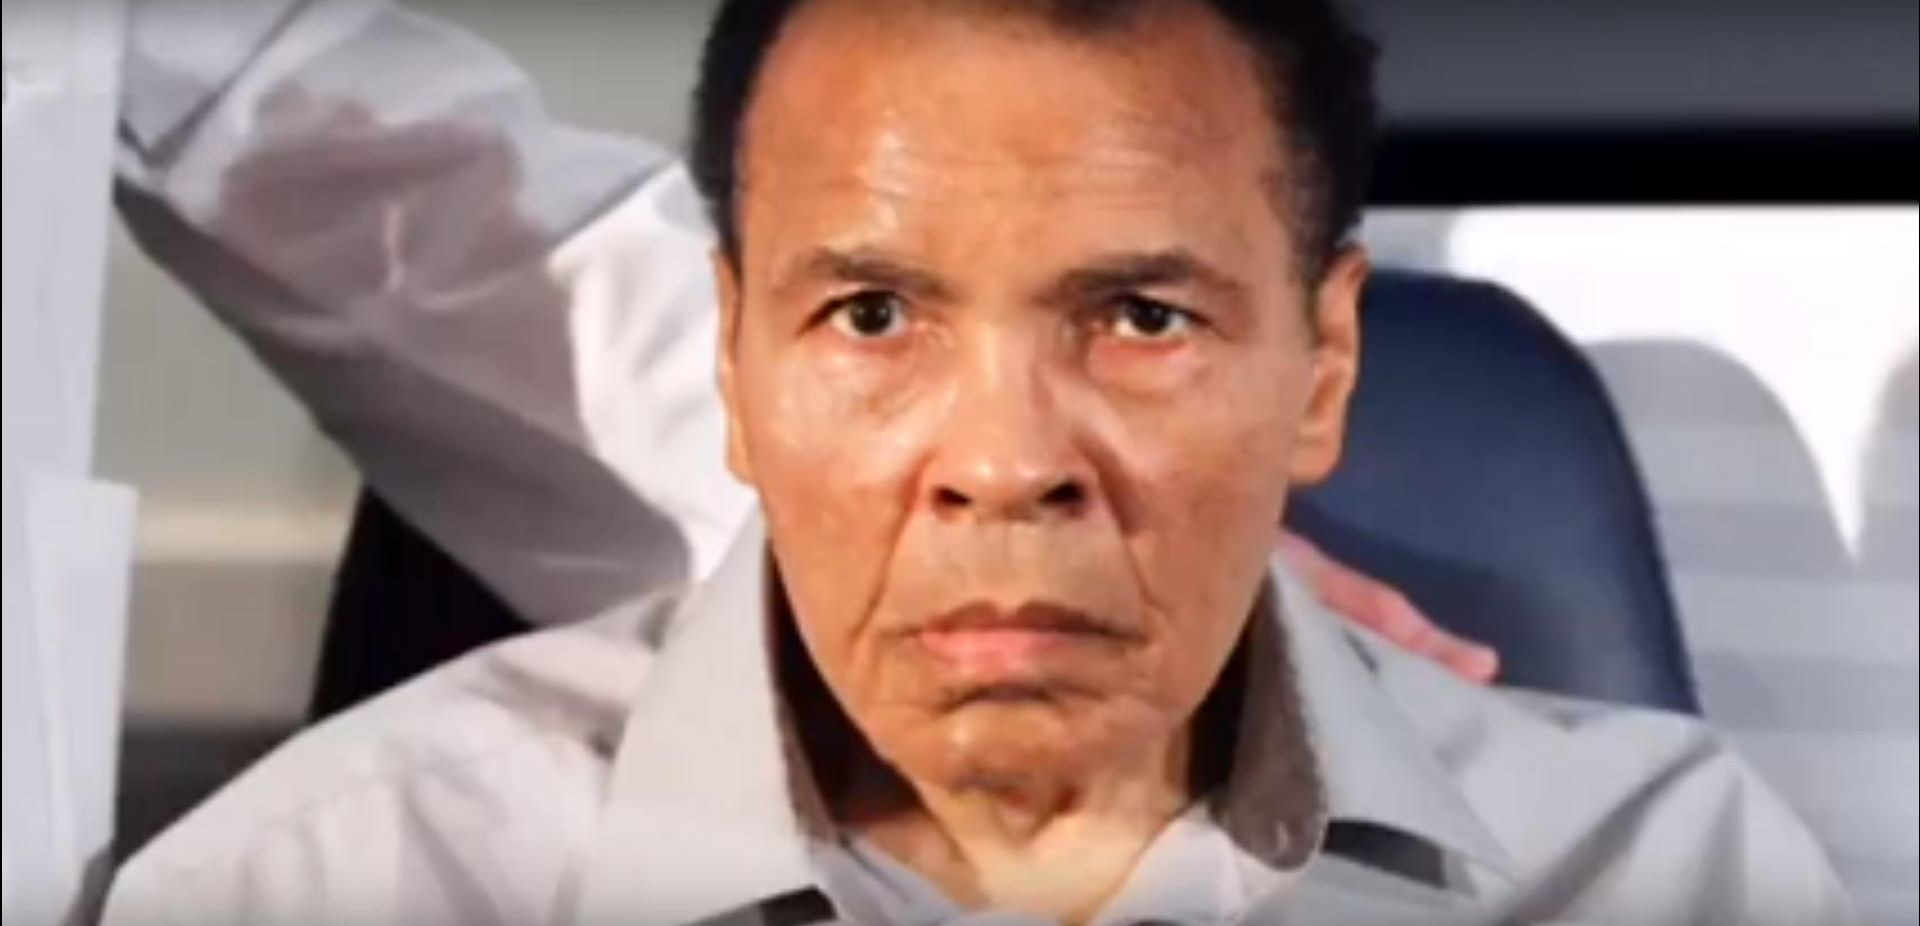 PROBLEMI S DISANJEM Boksačka legenda Muhammad Ali (74) završio u bolnici